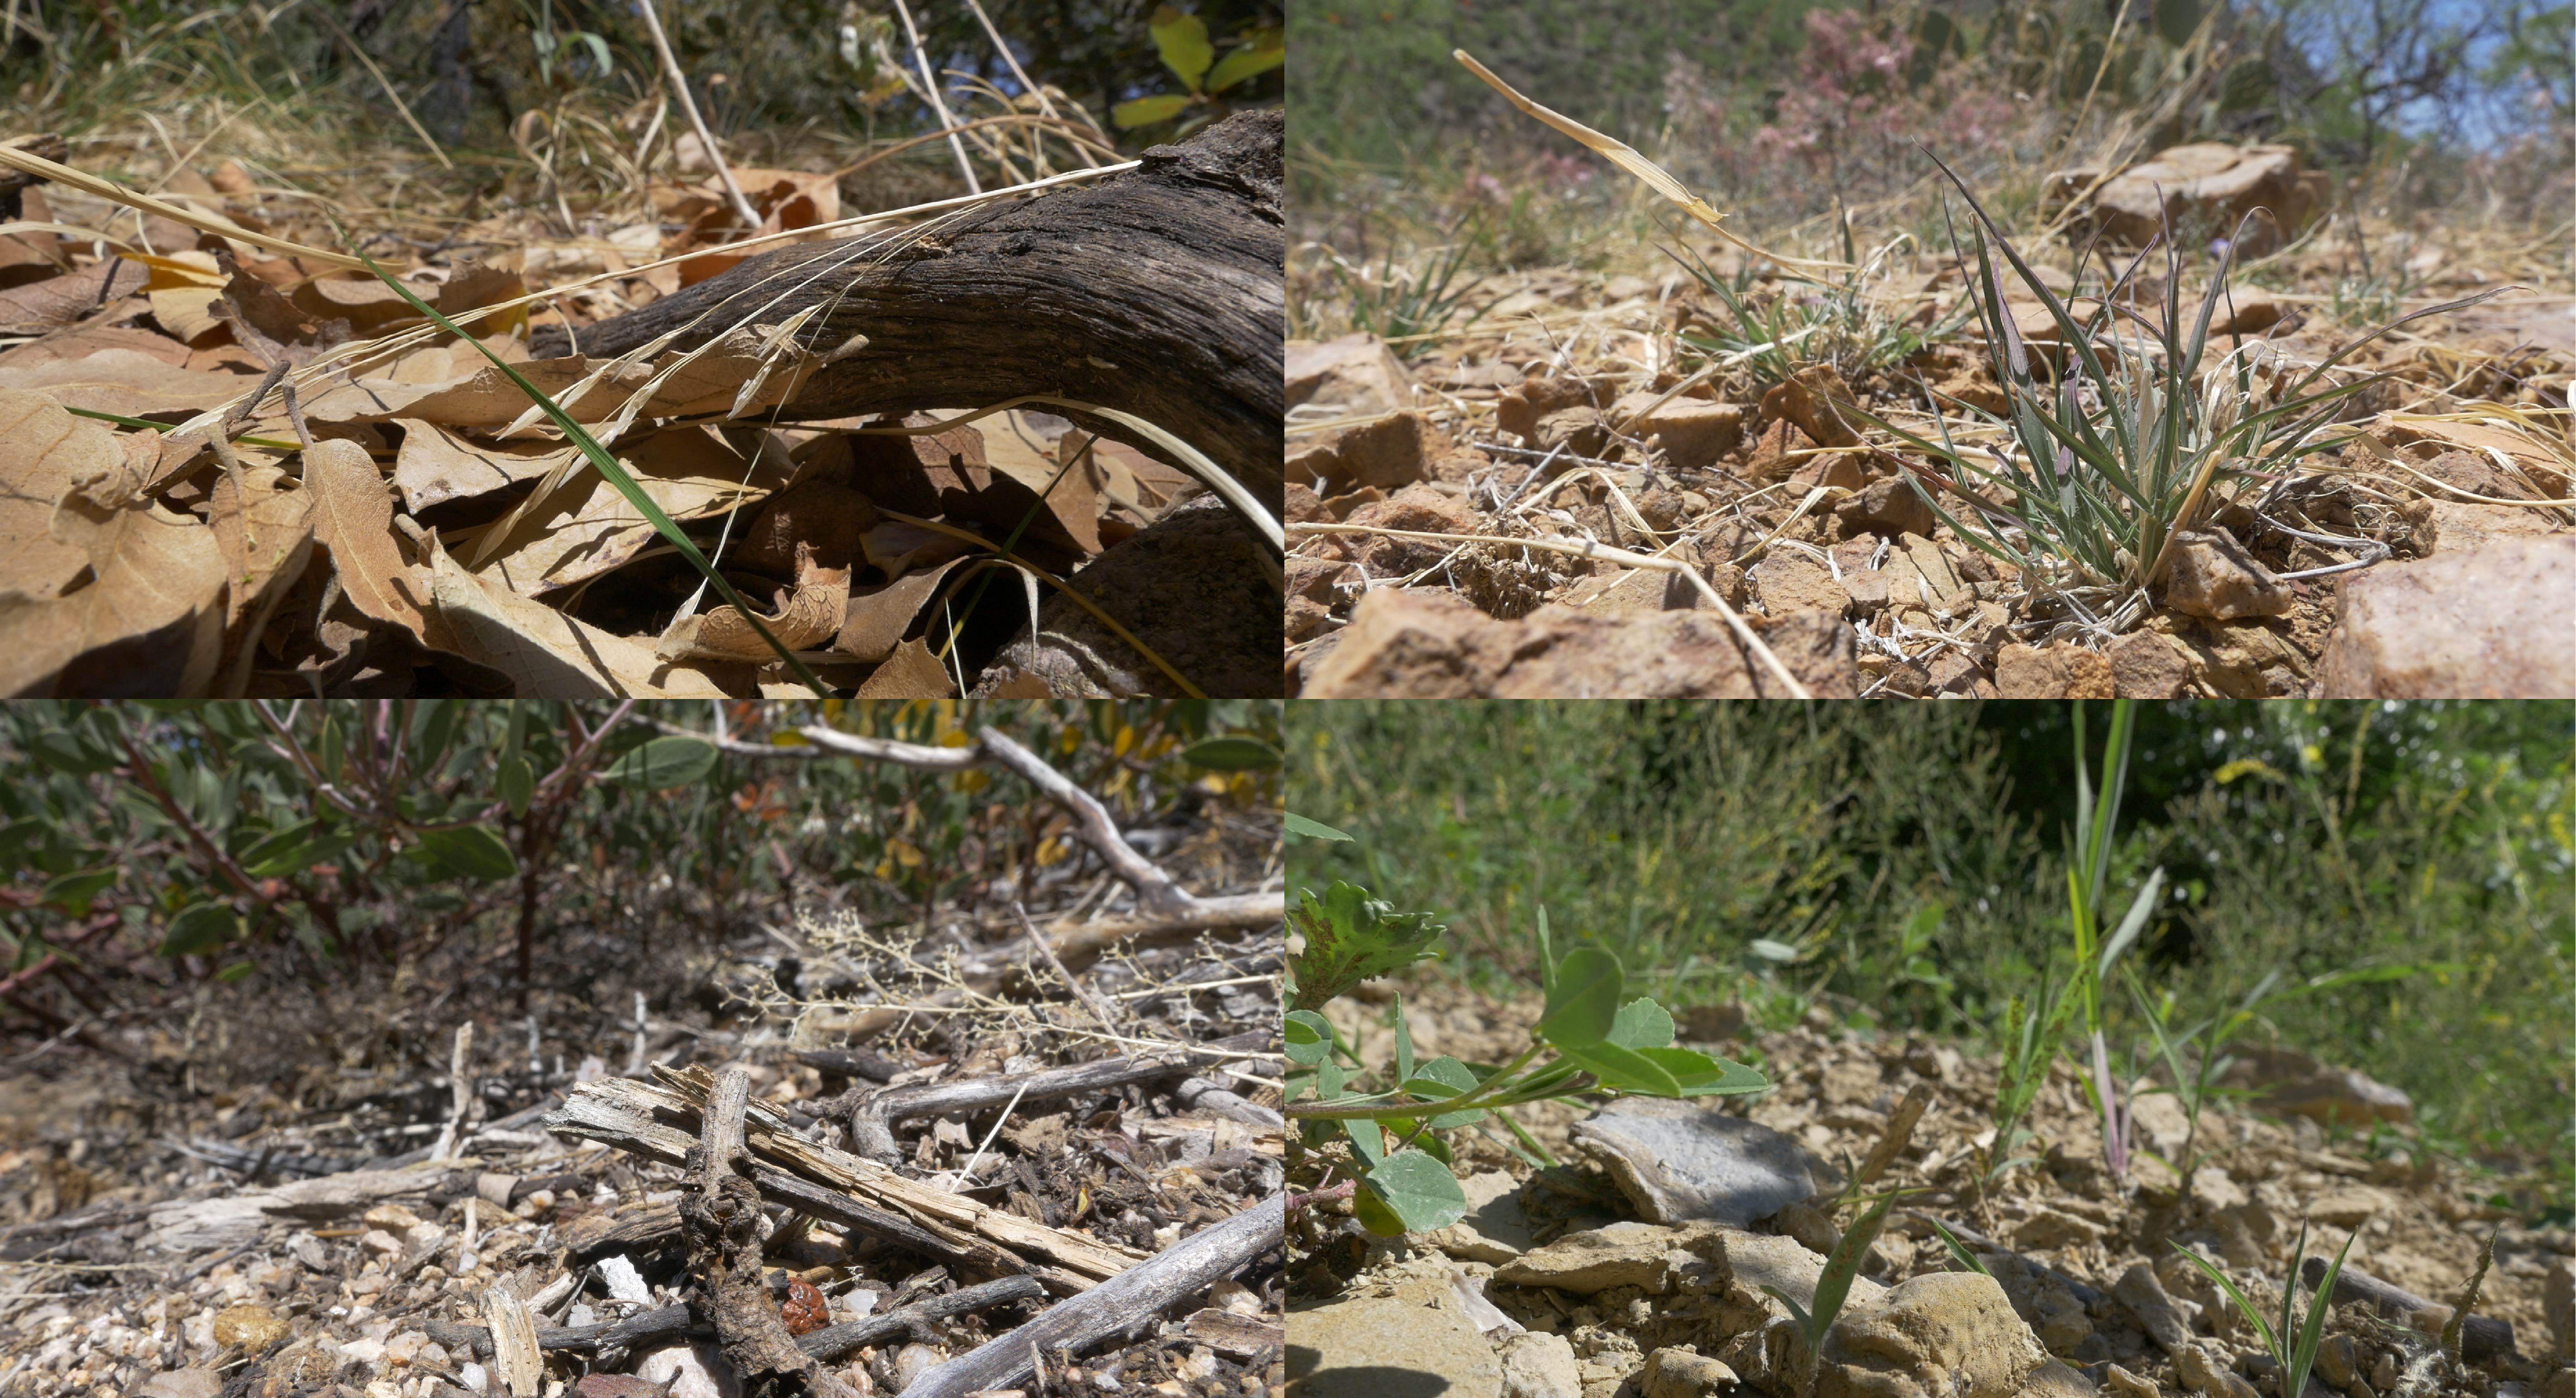 Collage of Habronattus spider habitats